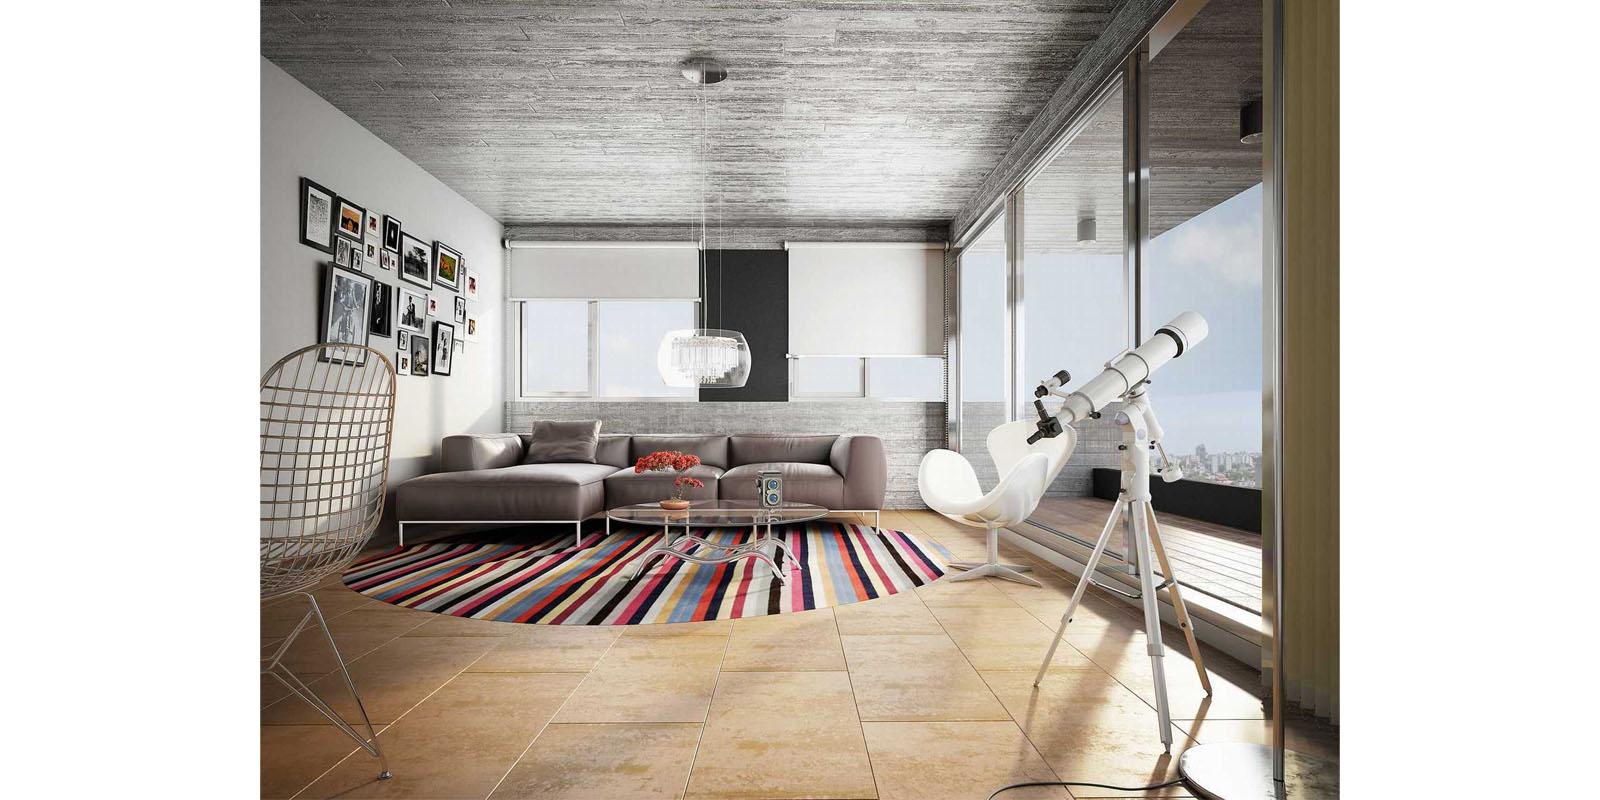 ProyectoC_Arquitectos_Portfolio_03_Melo